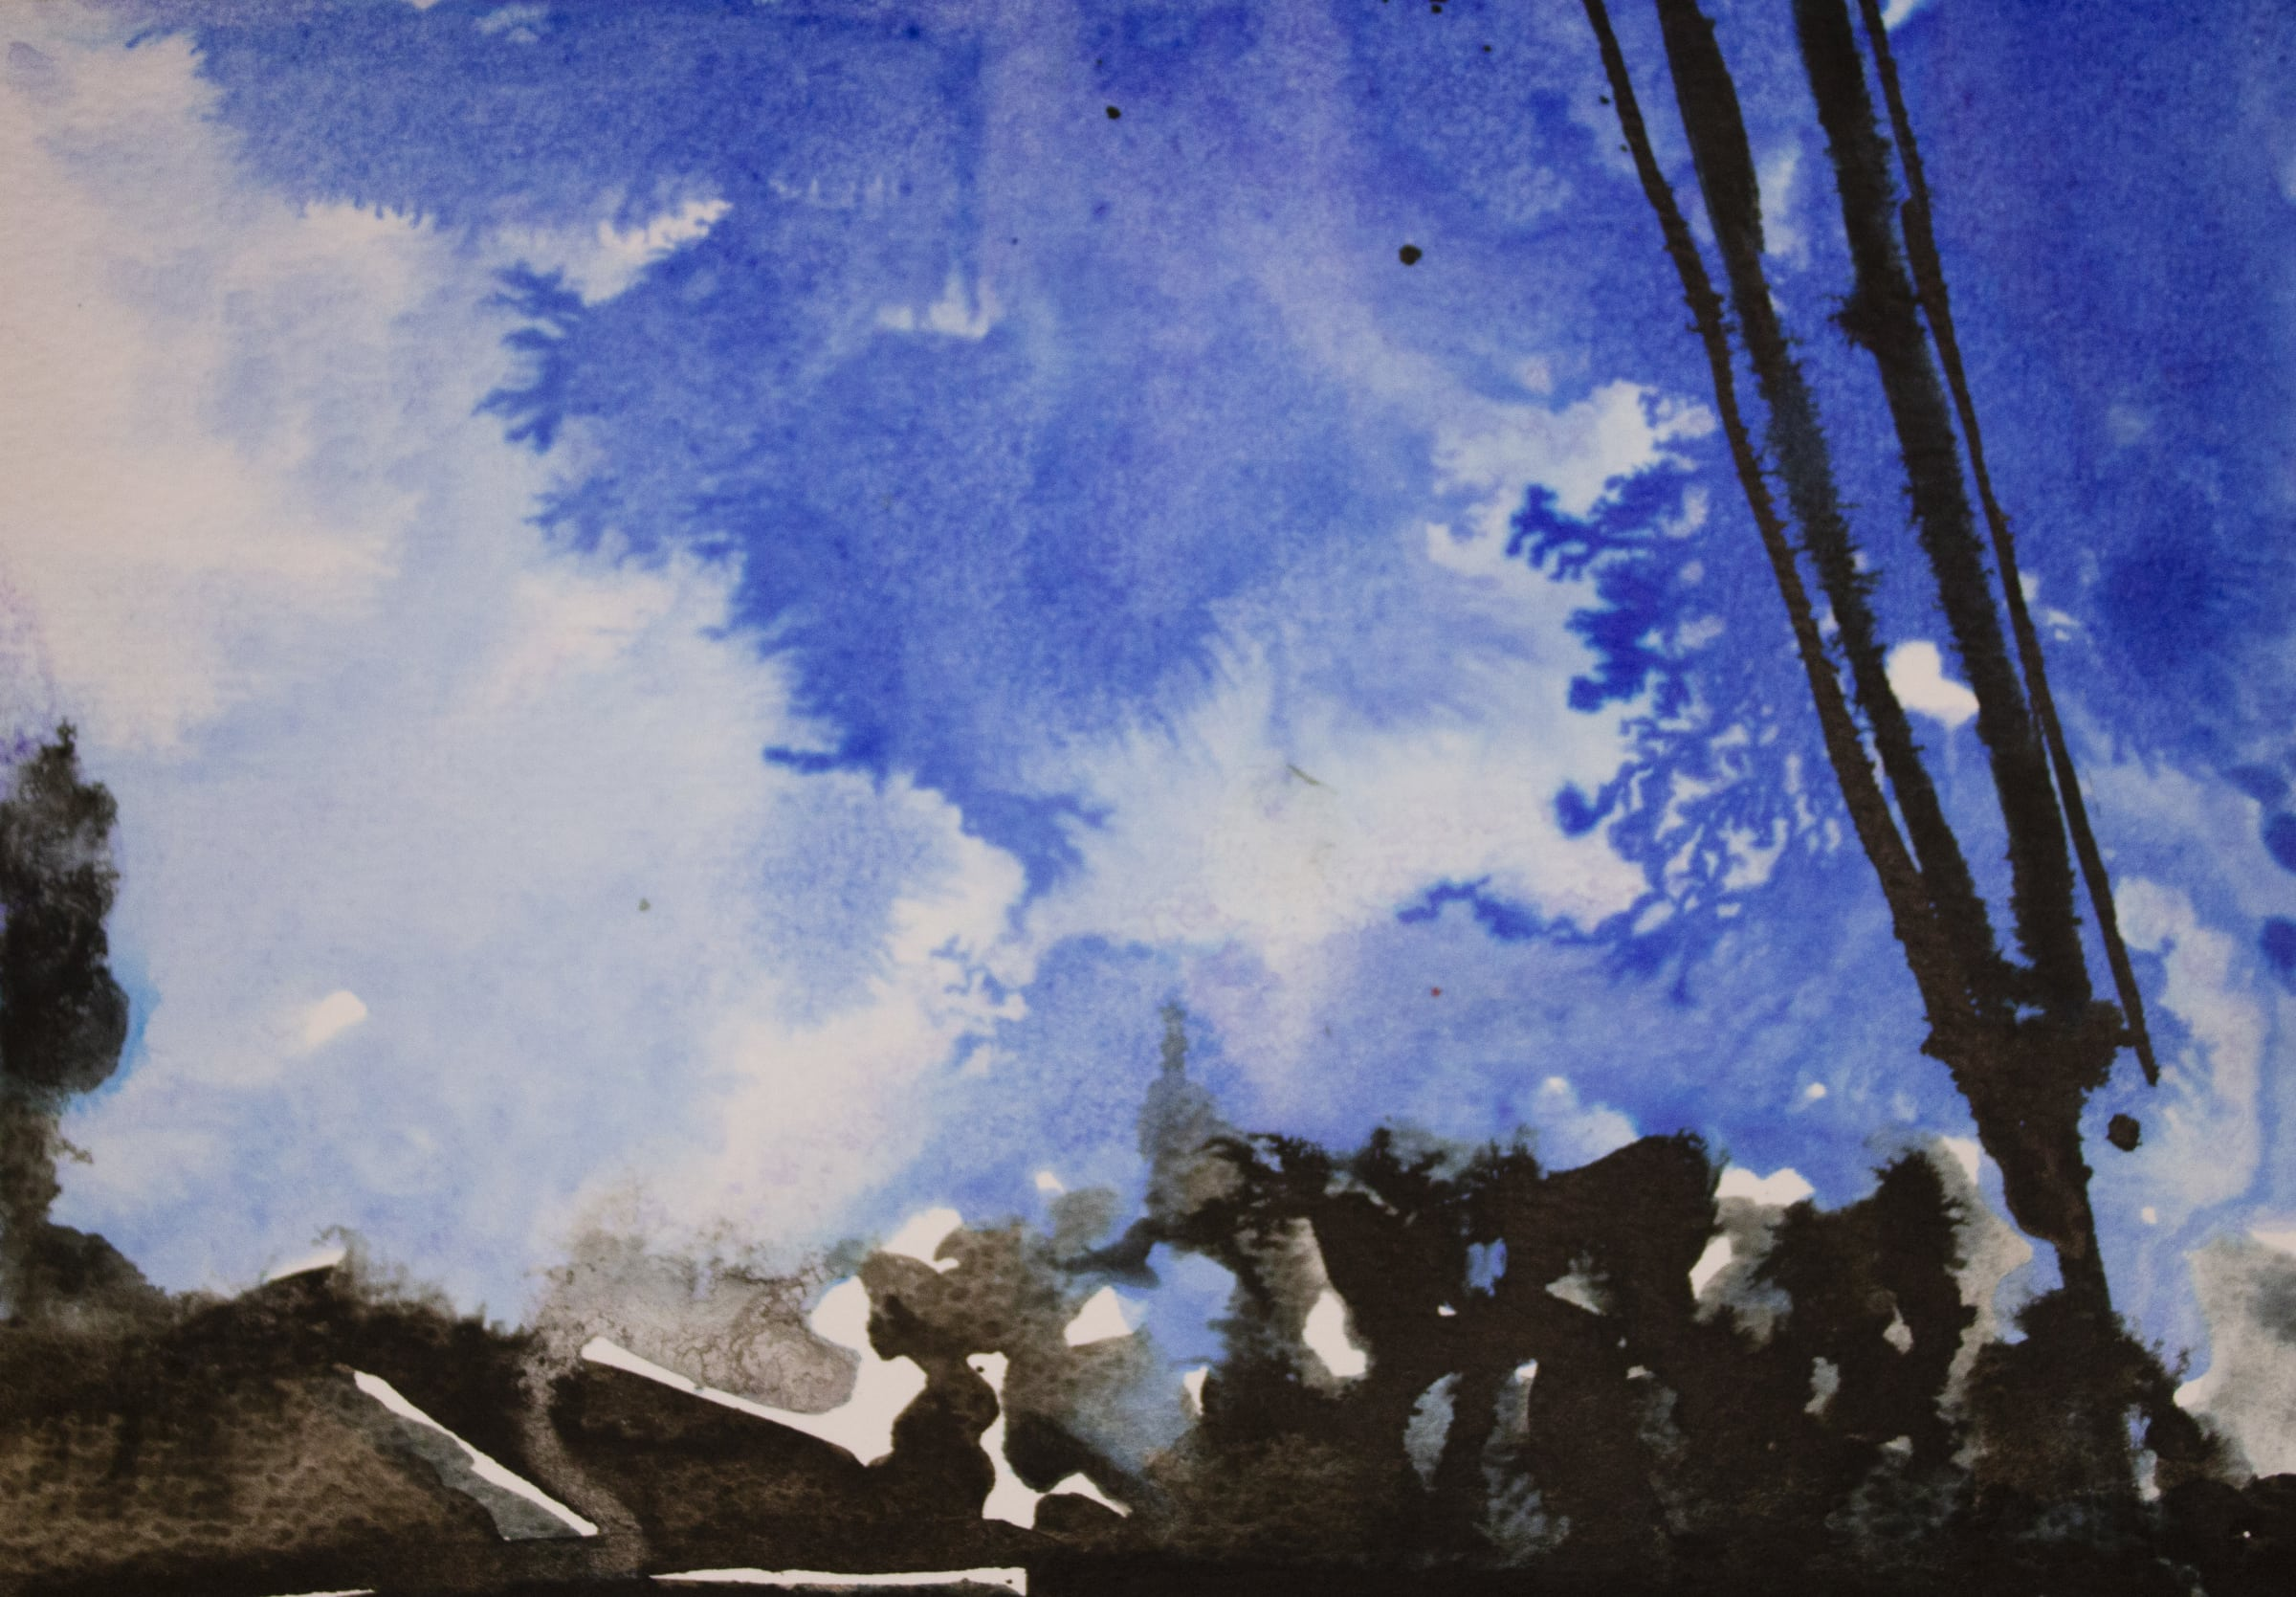 <span class=&#34;link fancybox-details-link&#34;><a href=&#34;/artists/88-louise-van-der-bijl/works/2295-louise-van-der-bijl-inktober-day-31-2018/&#34;>View Detail Page</a></span><div class=&#34;artist&#34;><strong>Louise Van Der Bijl</strong></div> <div class=&#34;title&#34;><em>Inktober Day 31</em>, 2018</div> <div class=&#34;medium&#34;>Ink On Paper</div> <div class=&#34;dimensions&#34;>15cm x 21cm</div><div class=&#34;price&#34;>R400.00</div>